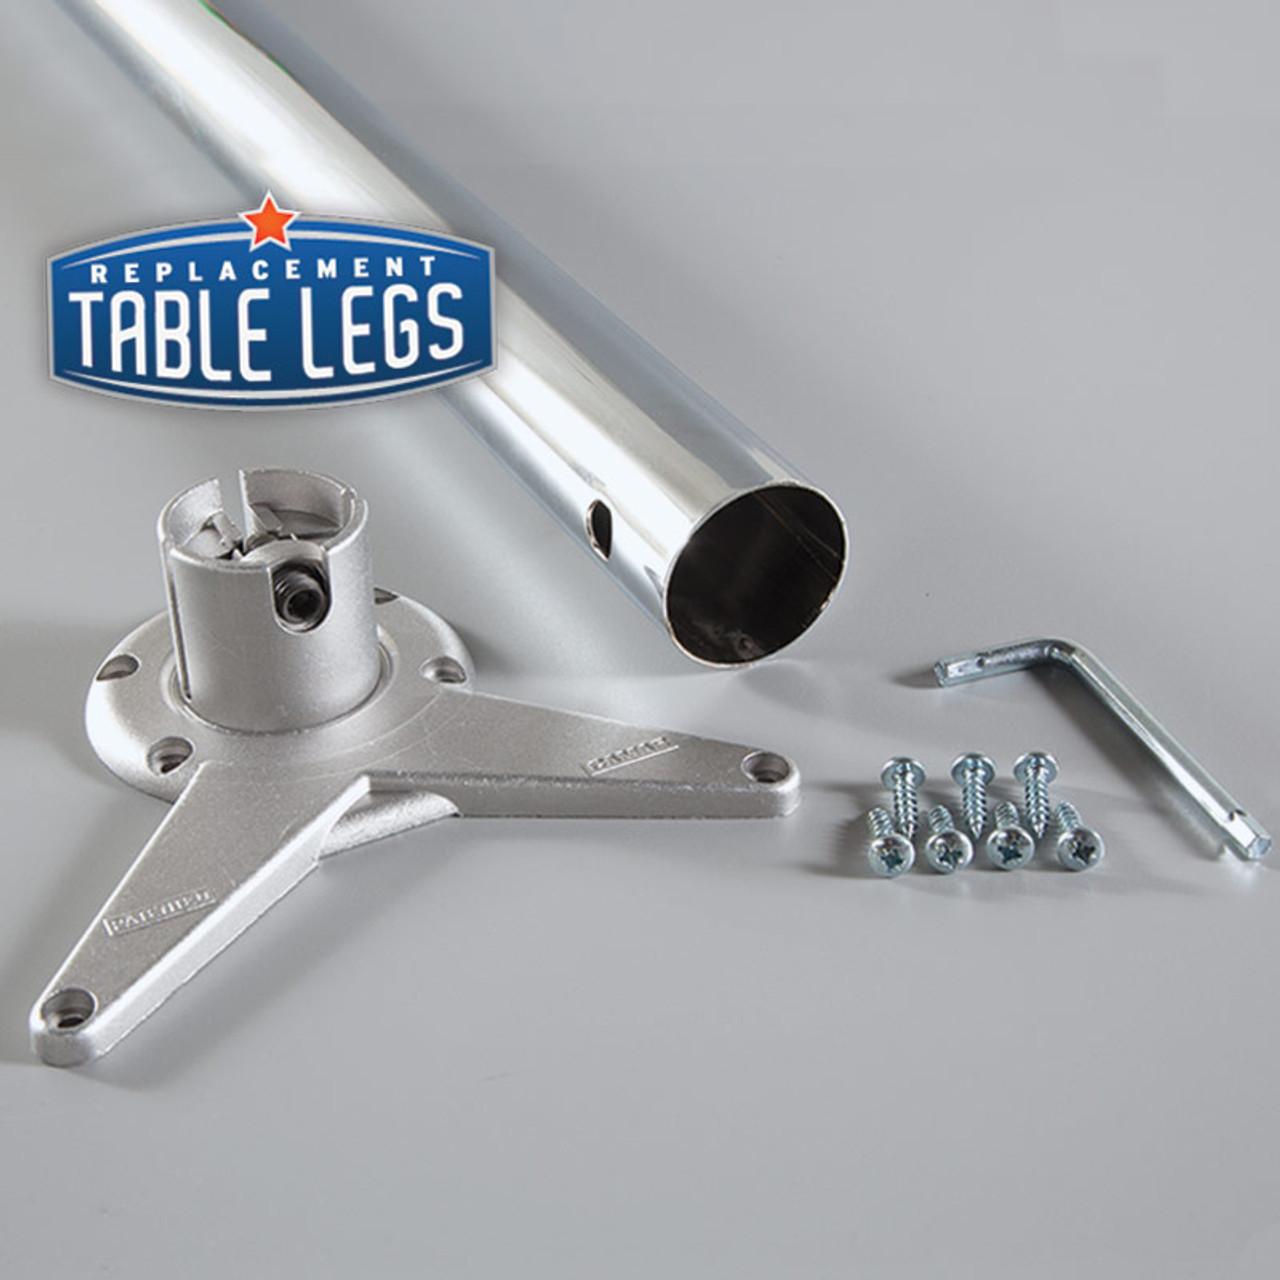 Brushed Steel Studio Telescoping Table Leg parts - replacementtablelegs.com